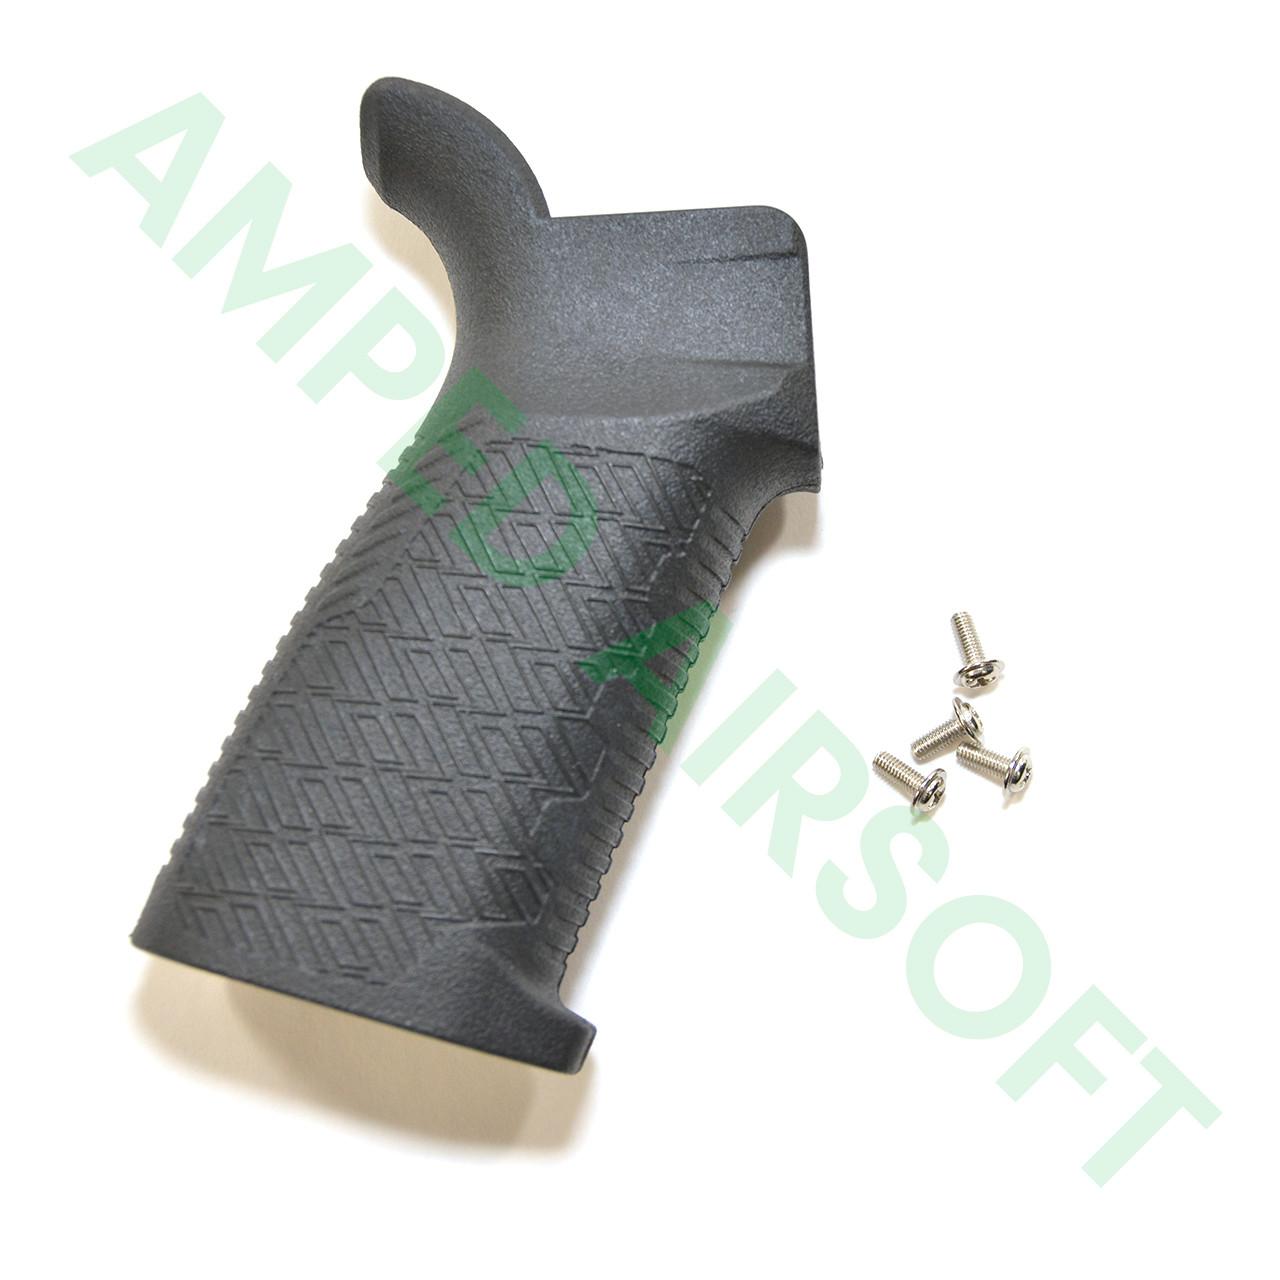 Madbull - Strike Industries M4 Enhanced Pistol Grip (AEG/Black) Right Side with Screws